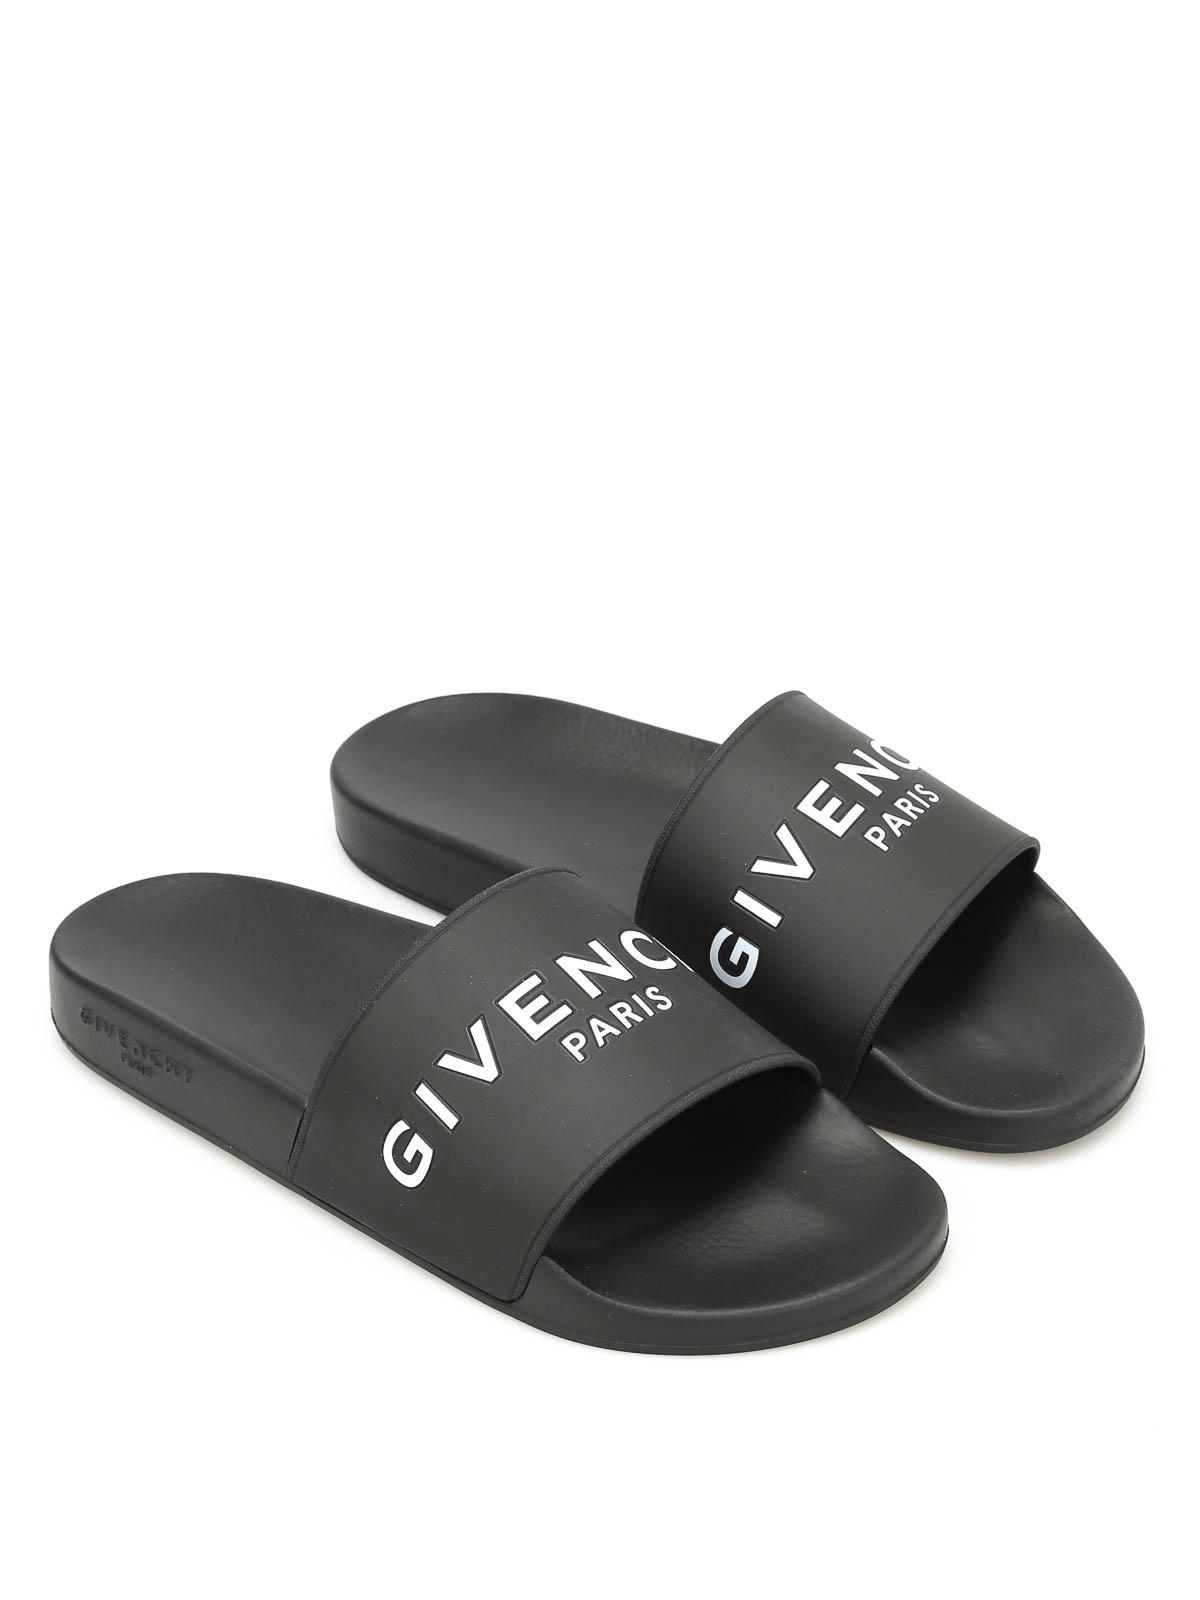 Schwarz Givenchy Herren 001 Sandalen Fur Bm08070894 j4RL5q3A